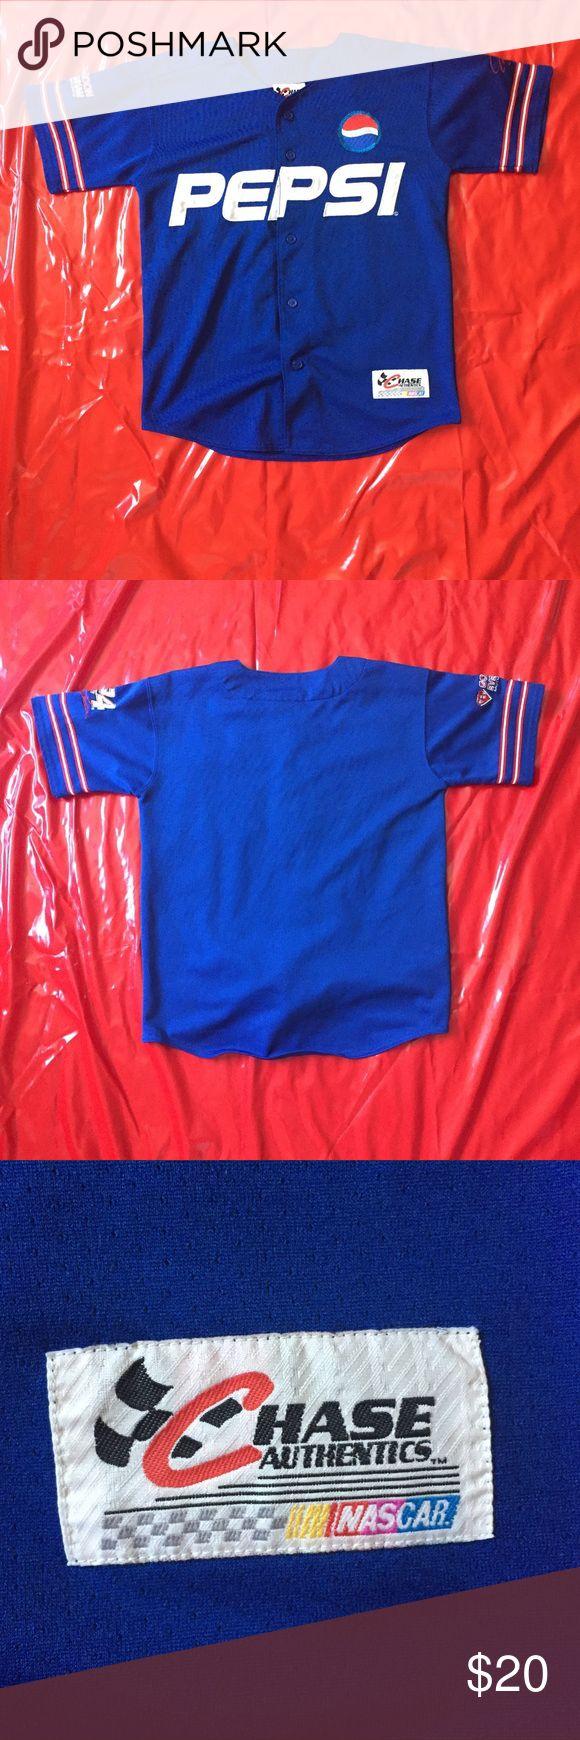 Pepsi Short-Sleeve Button Jersey. Jersey Material Official Nascar Merchandise. Tops